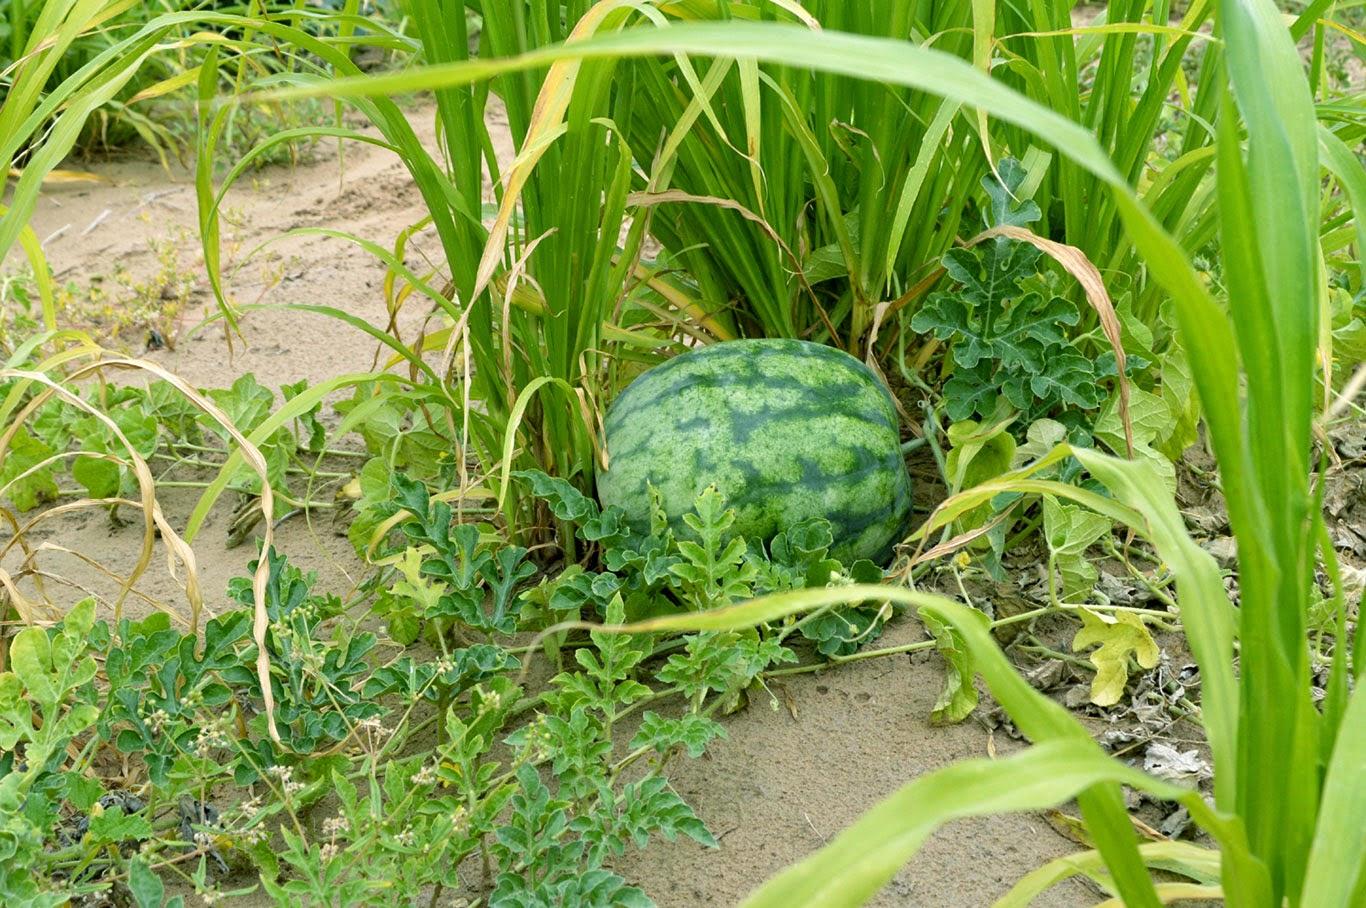 watermelon in farm house